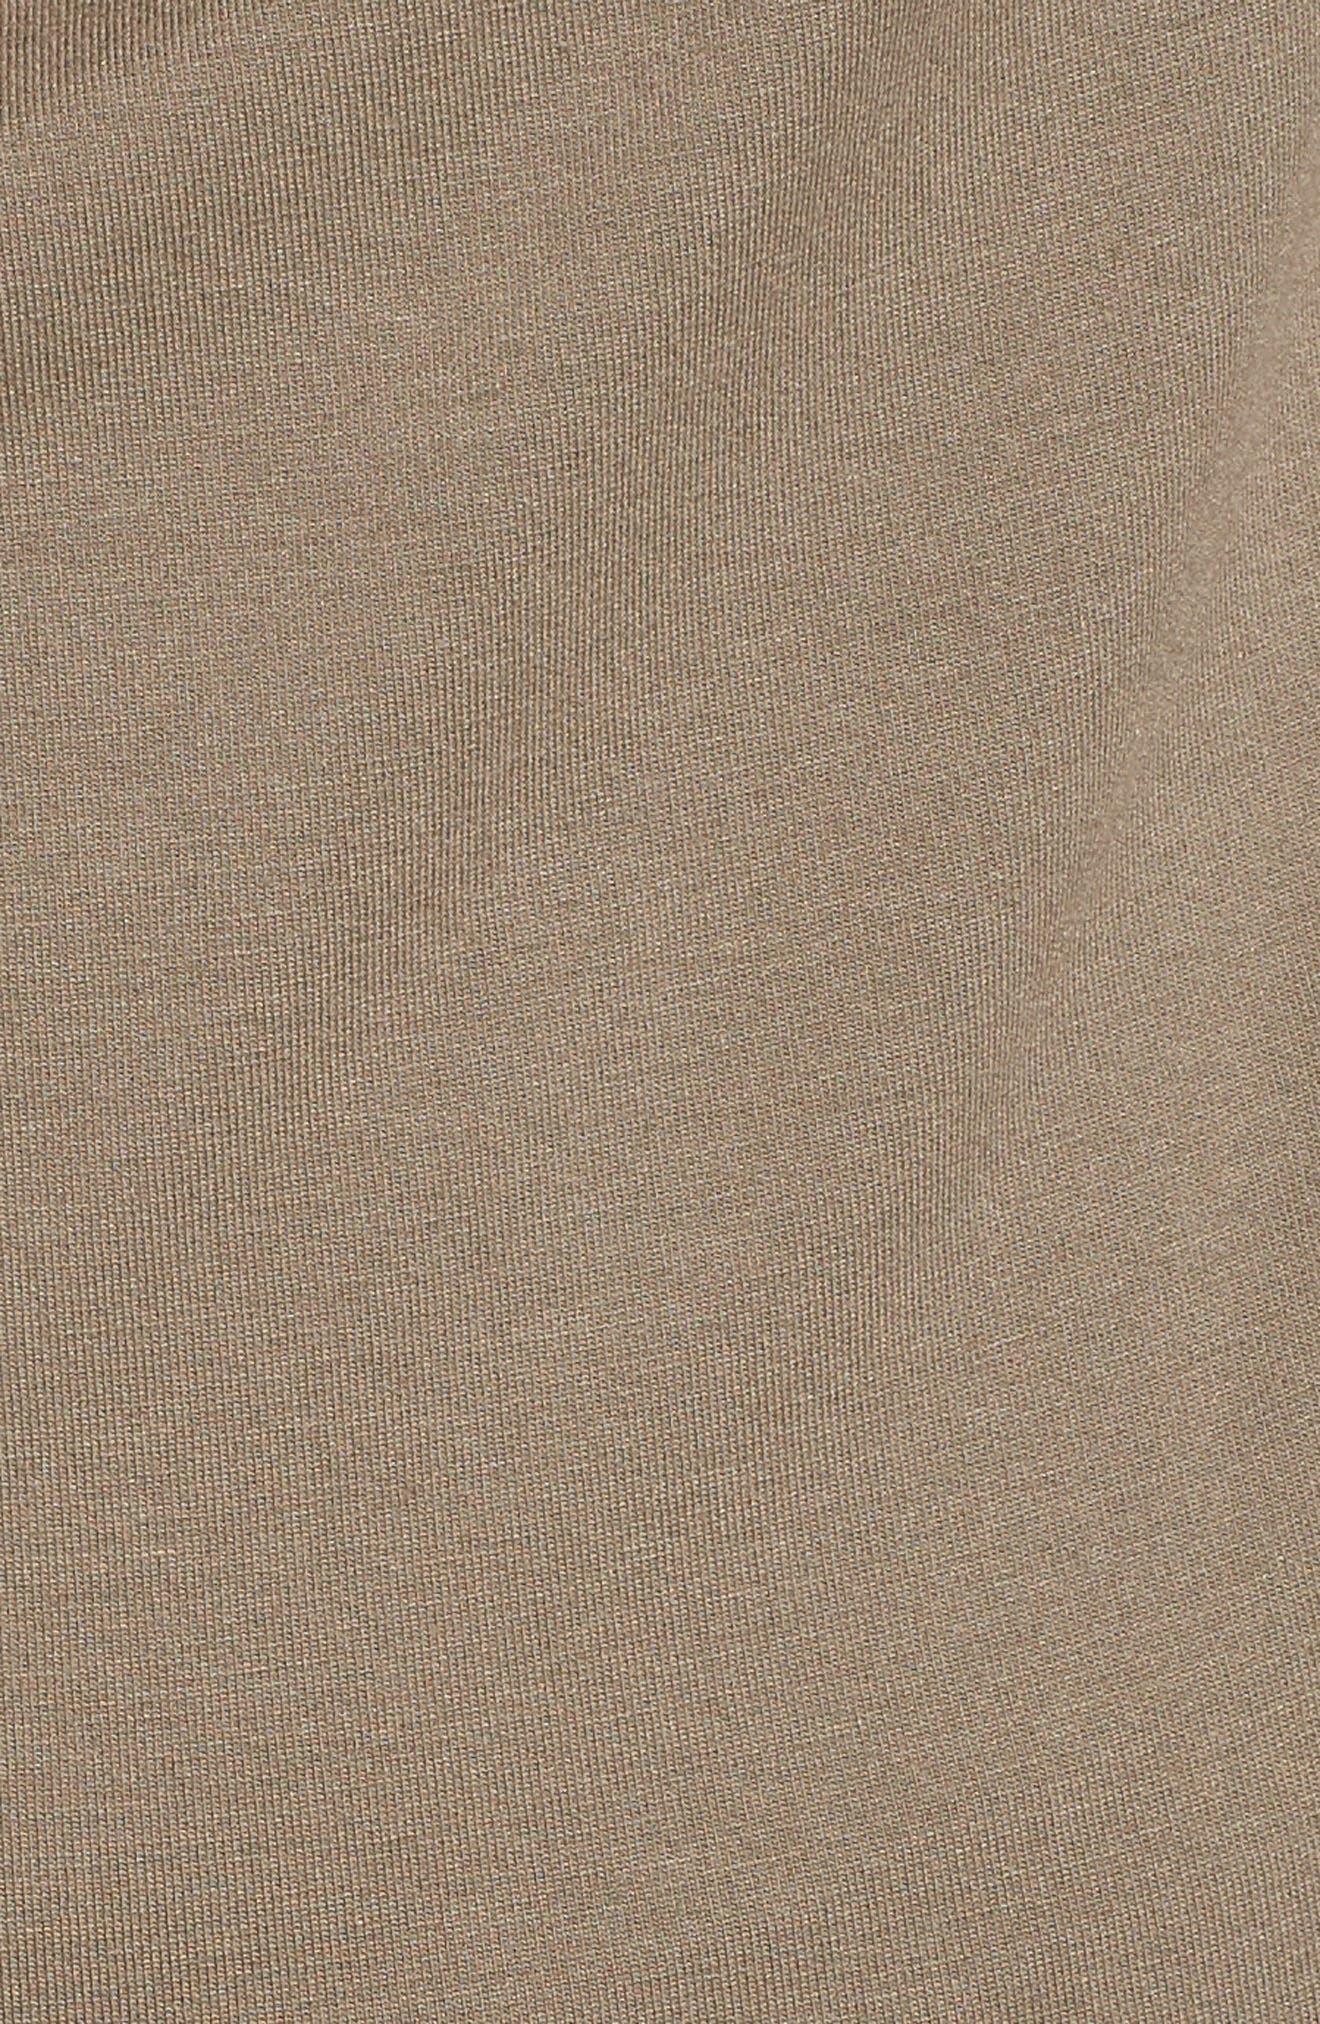 Tangy Drape Neck Sleeveless Top,                             Alternate thumbnail 5, color,                             302